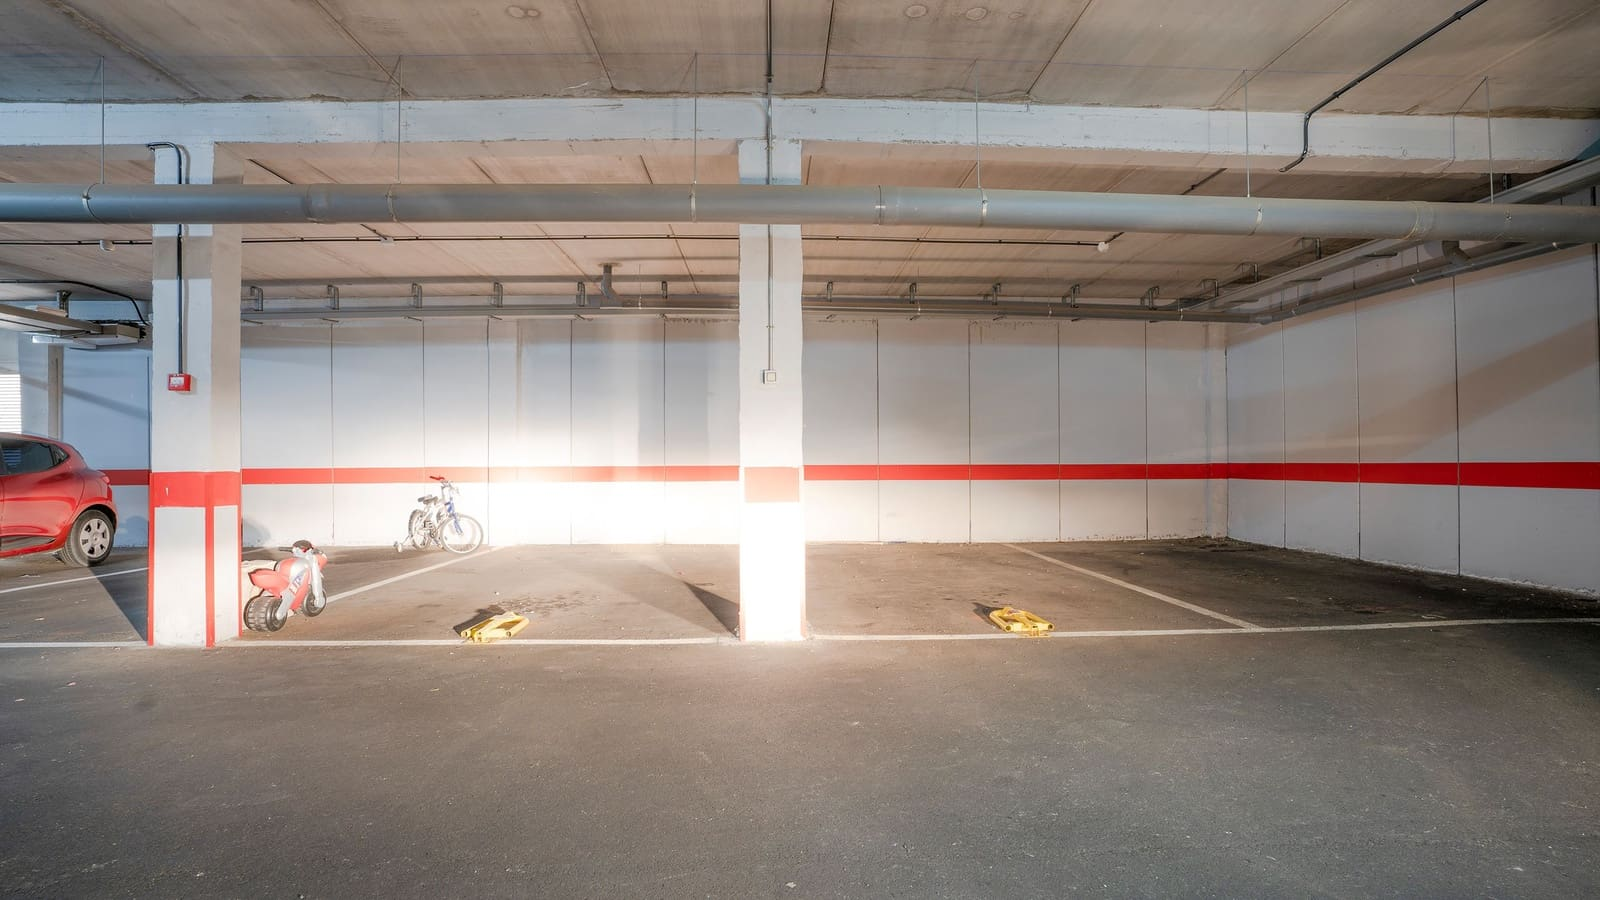 Garagem para venda em Llano del Camello - 21 000 € (Ref: 6012985)